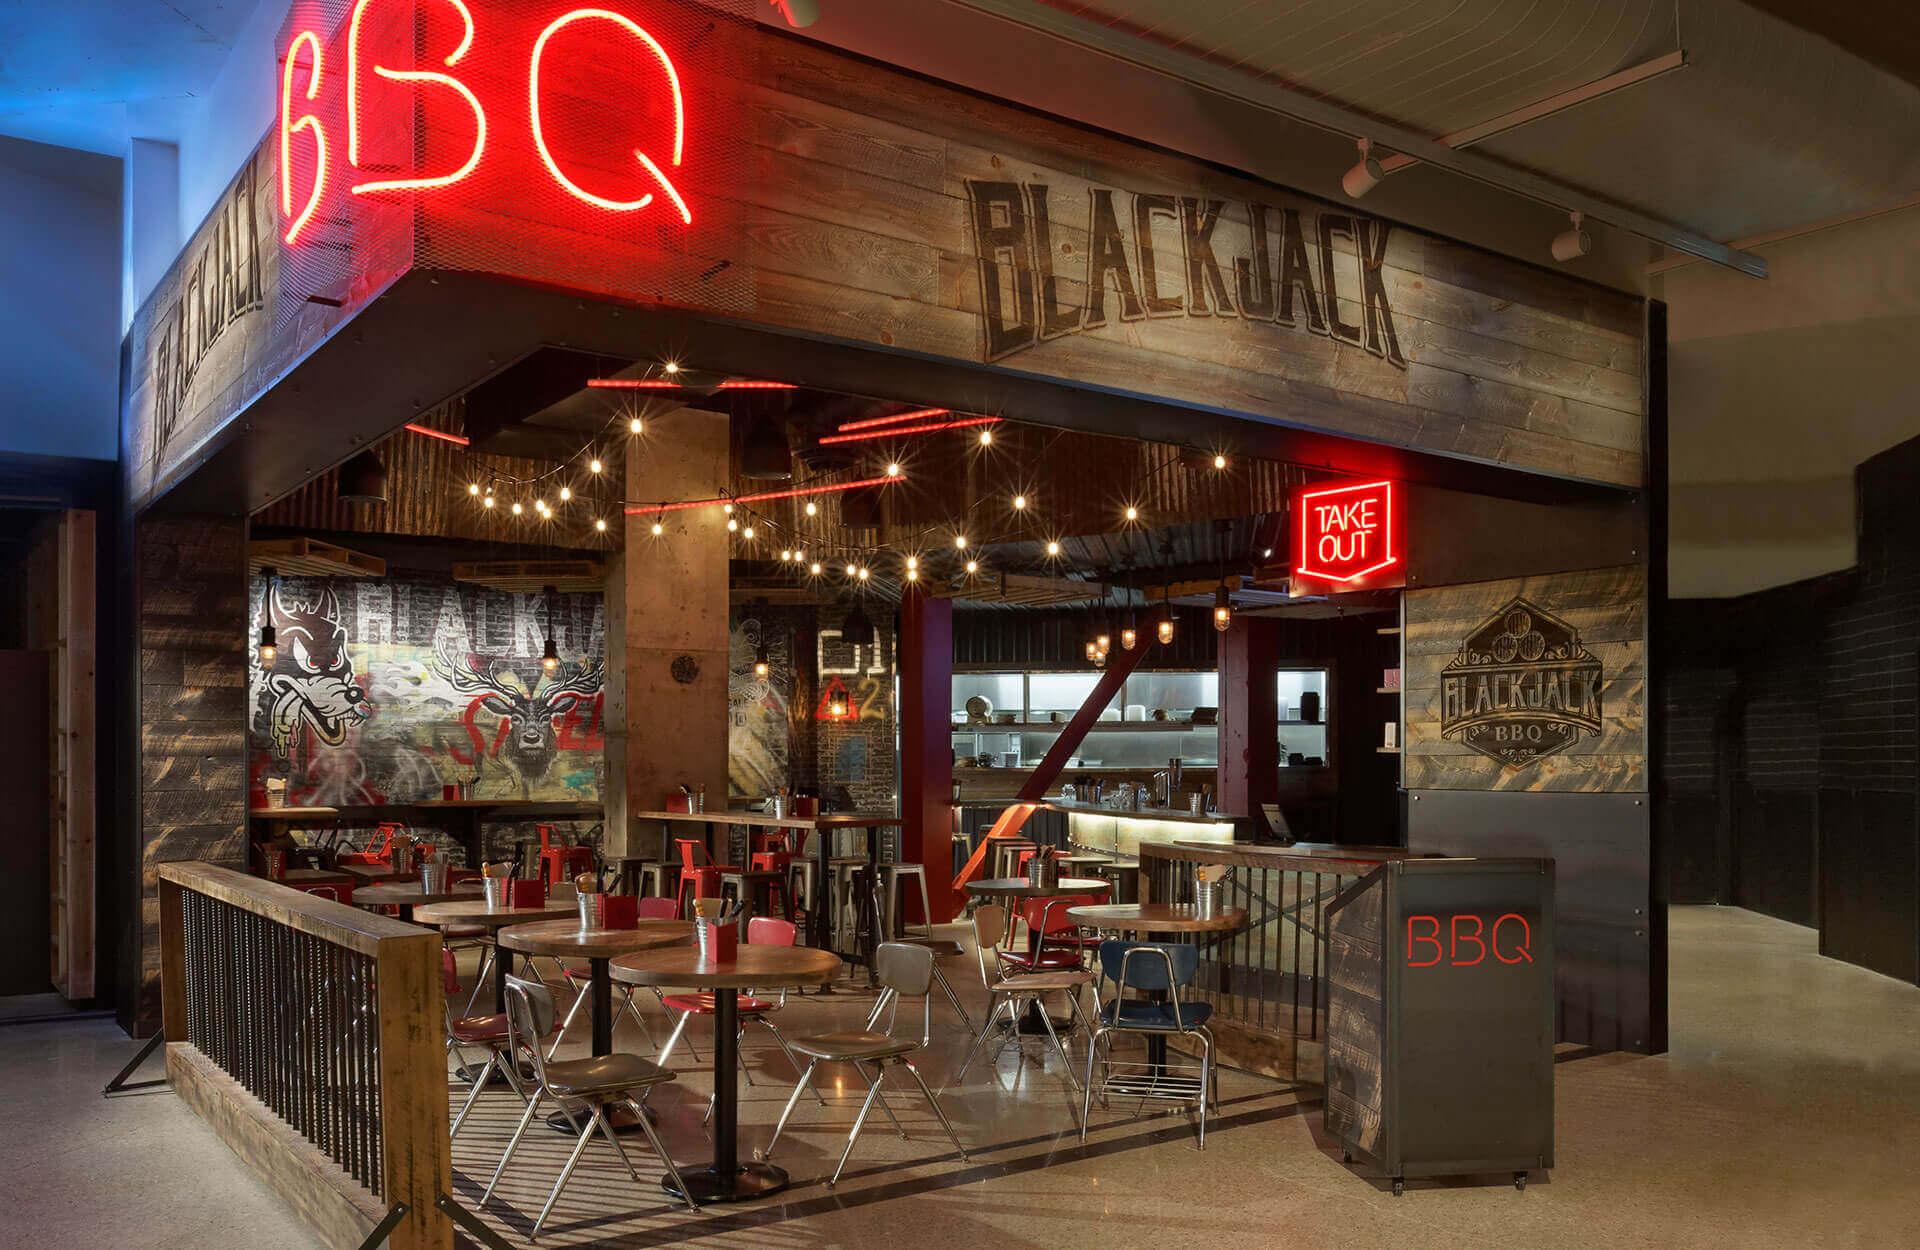 Blackjack BBQ